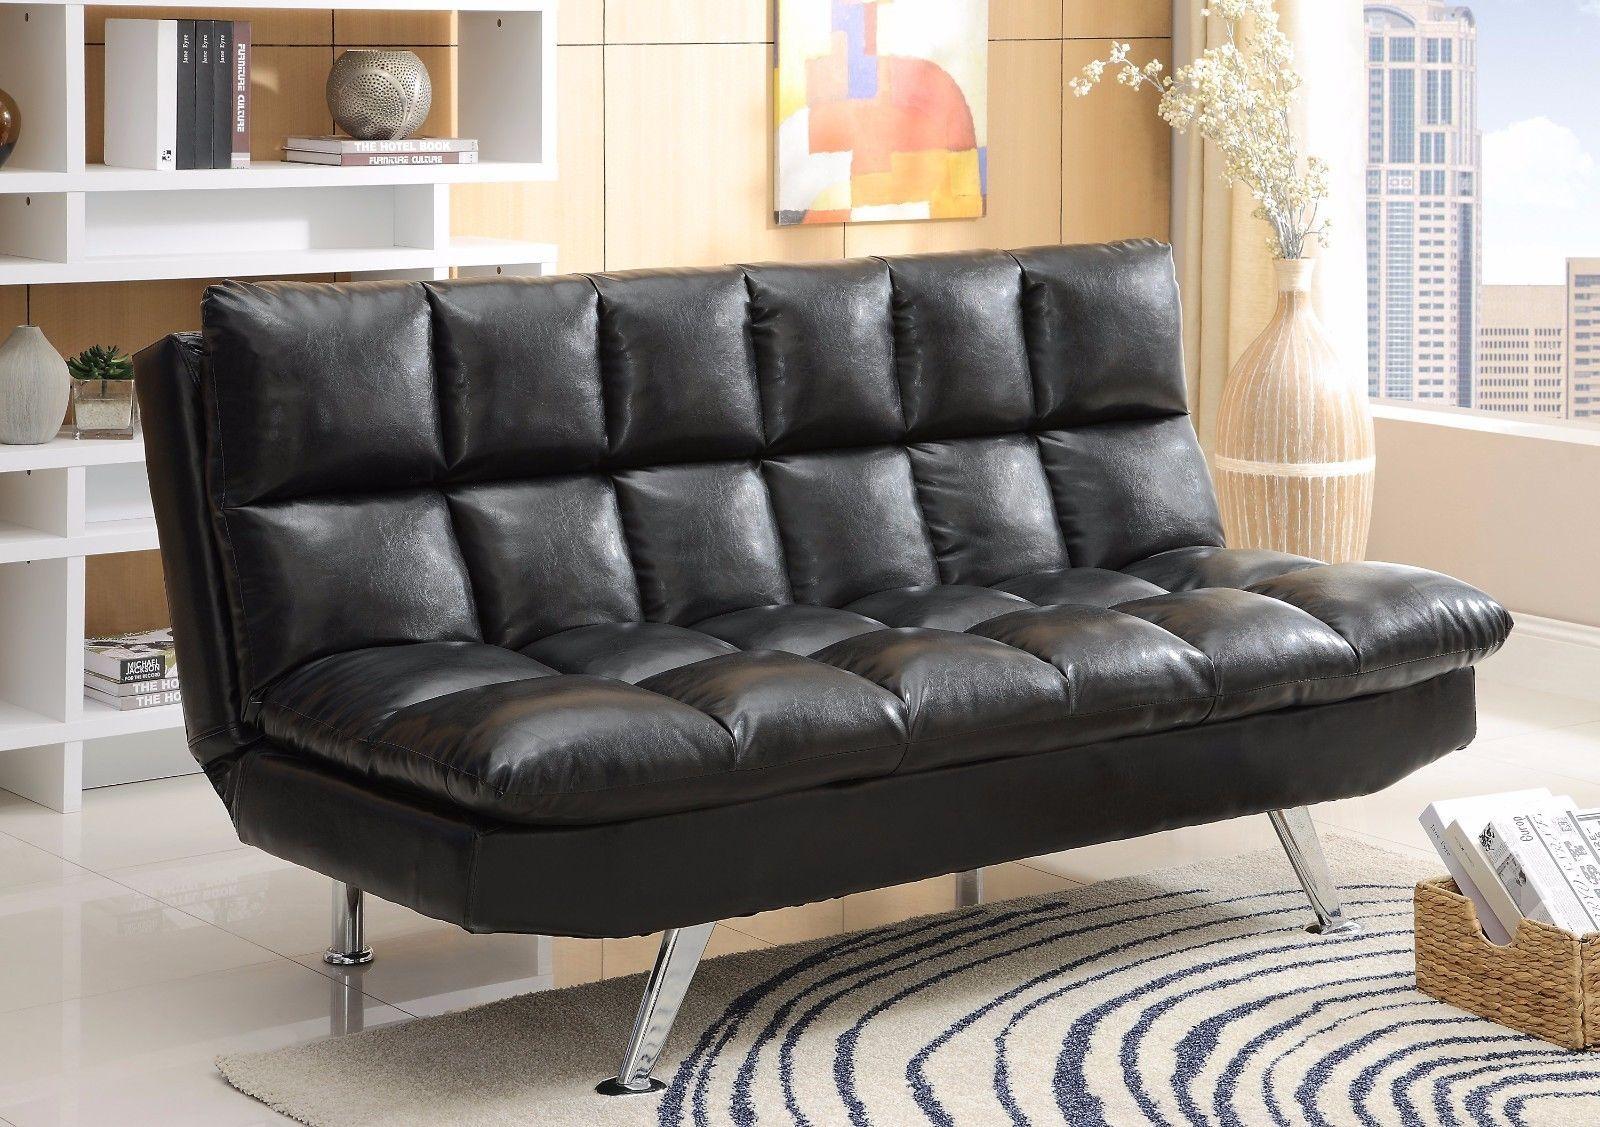 Crown Mark 5250 Sundown Adjustable Sofa Black Finish Transitional Style